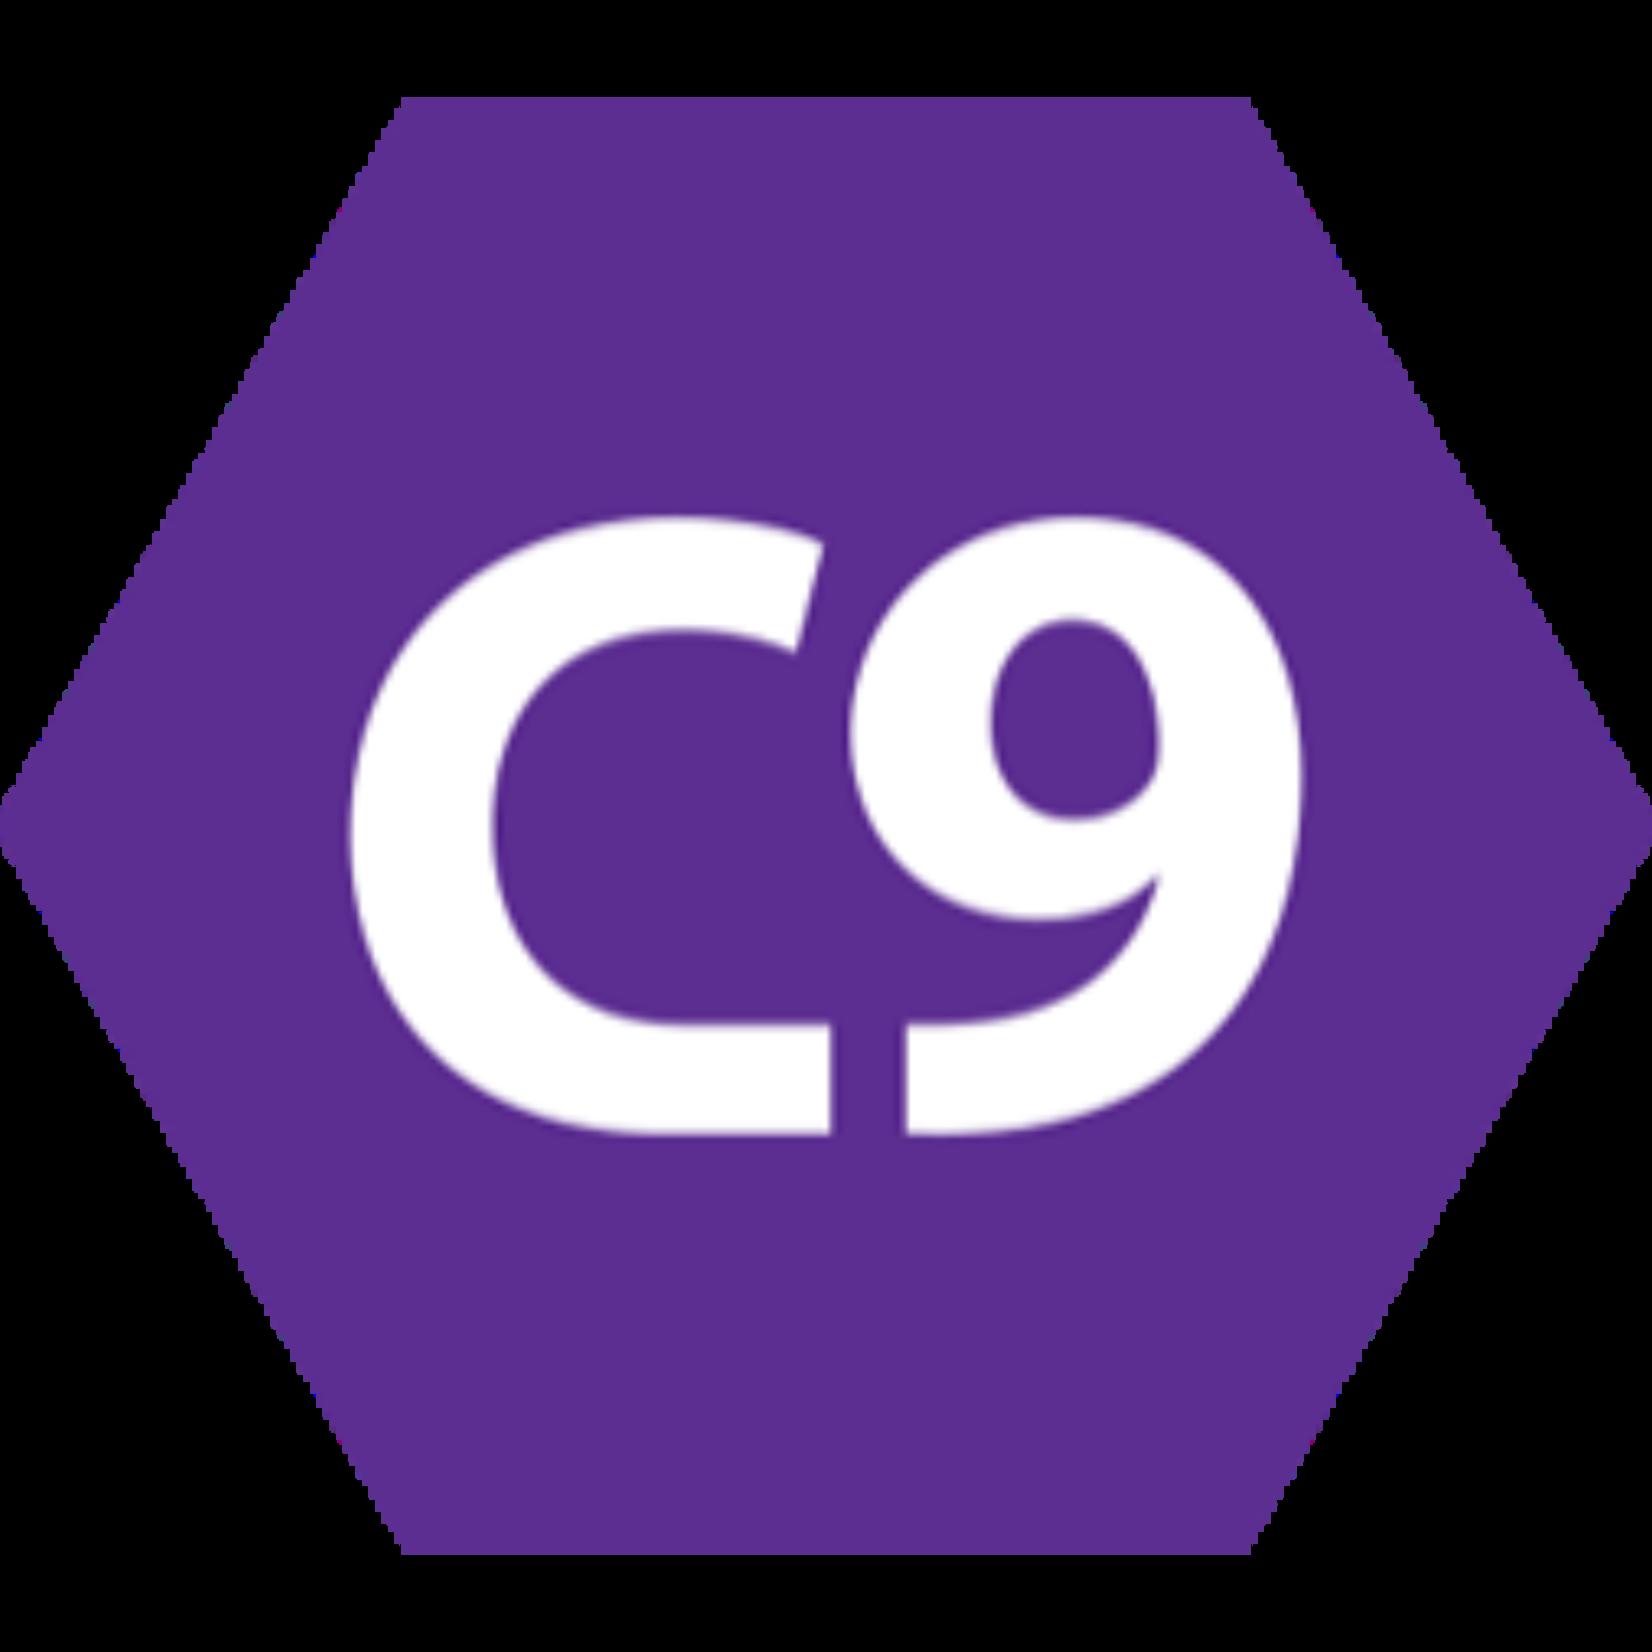 forever C9 - REINIGUNG